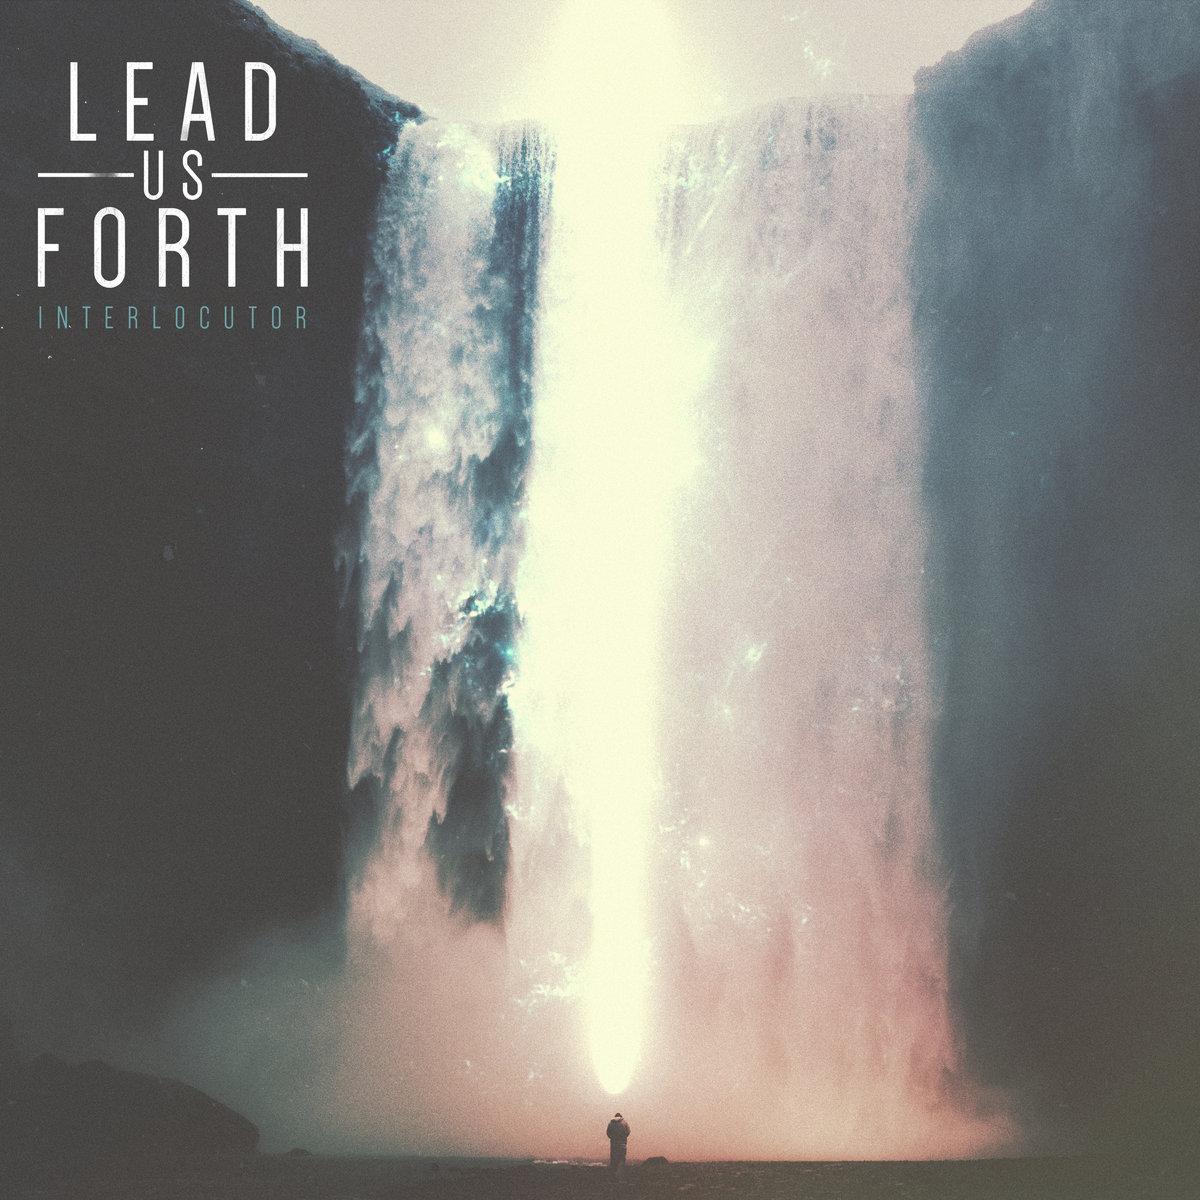 Lead Us Forth - Interlocutor (2016)